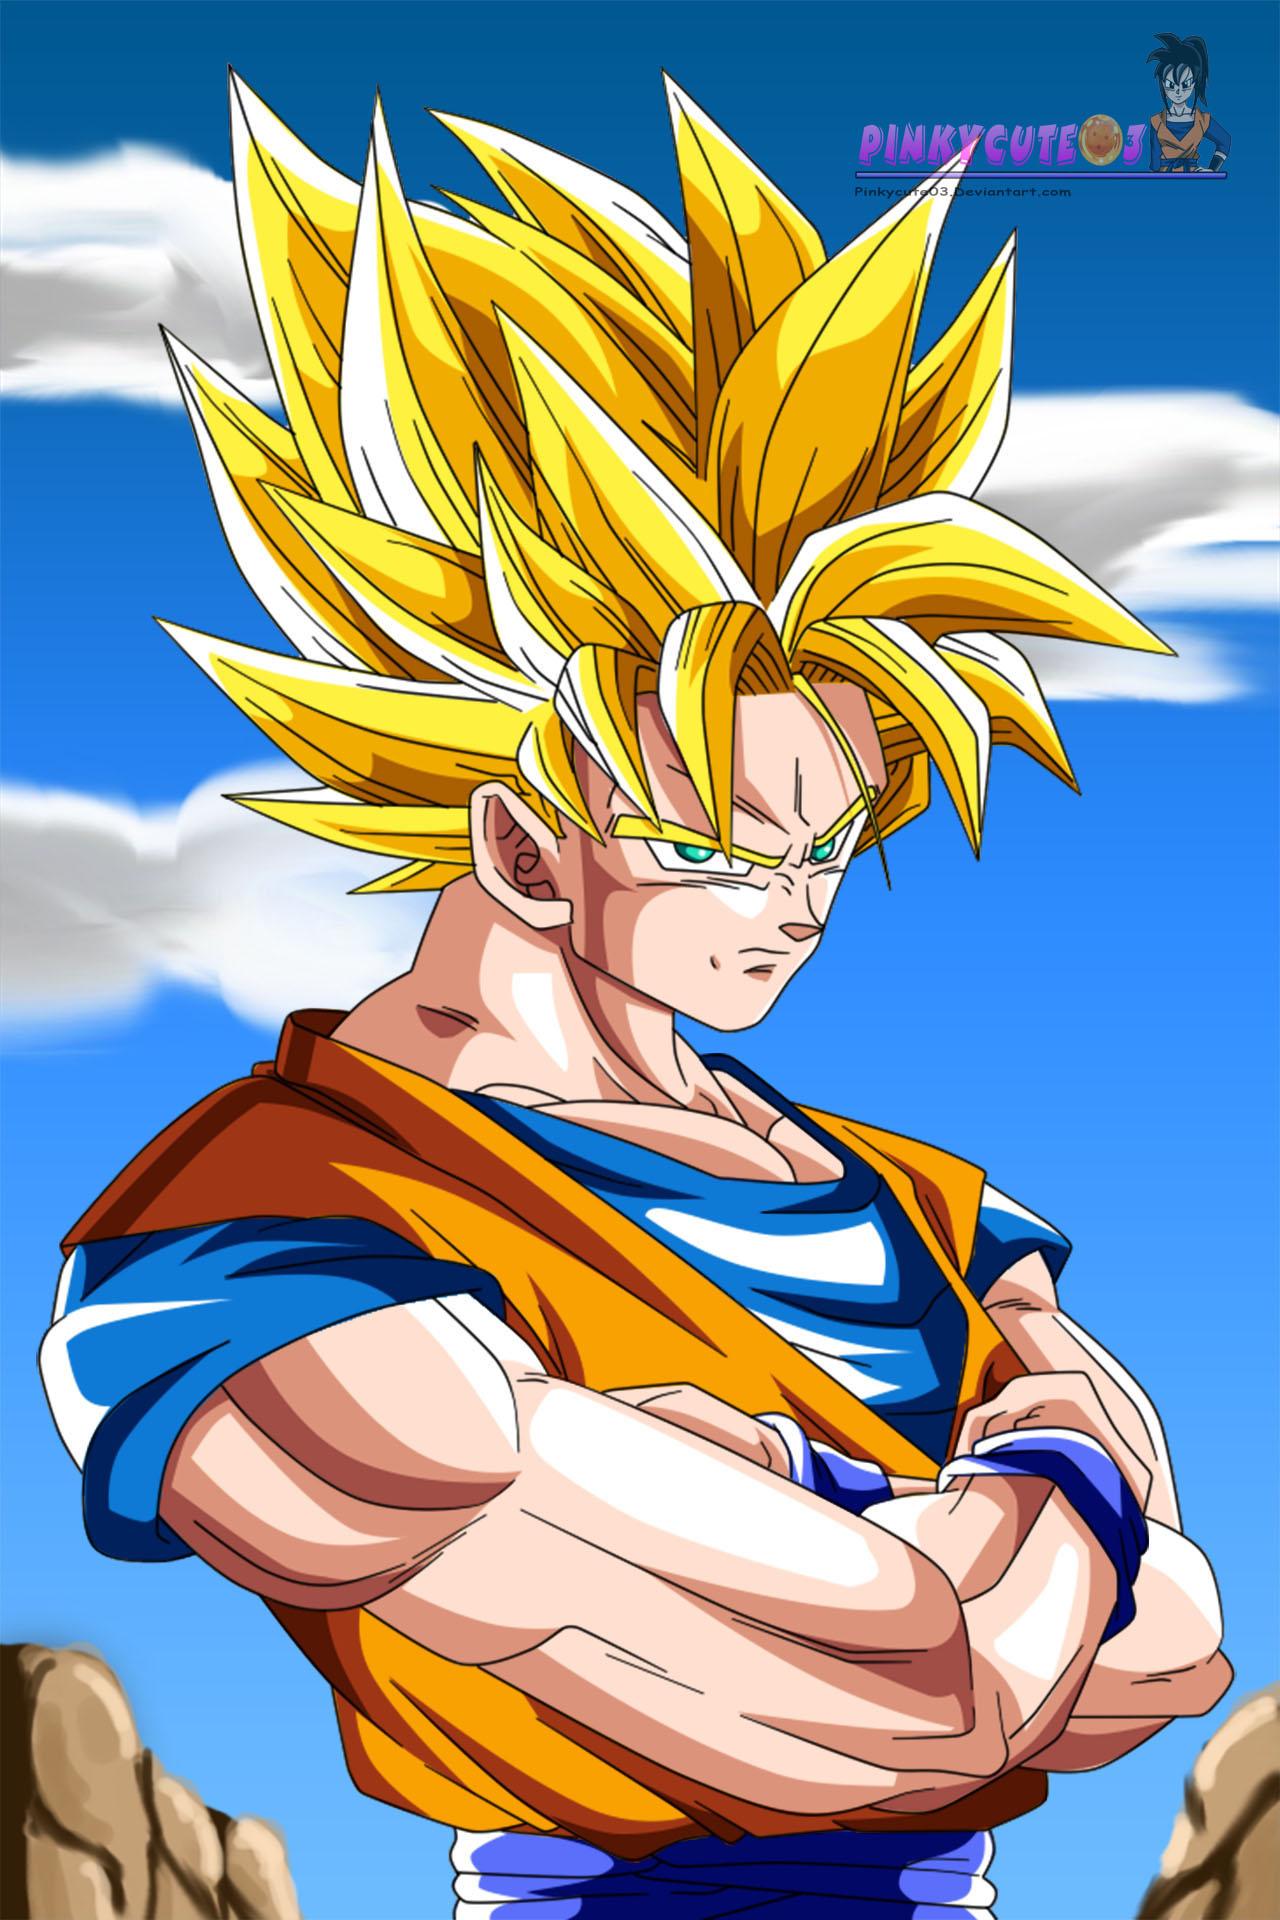 Super Saiyan 2 Son Goku By Pinkycute03 On Deviantart